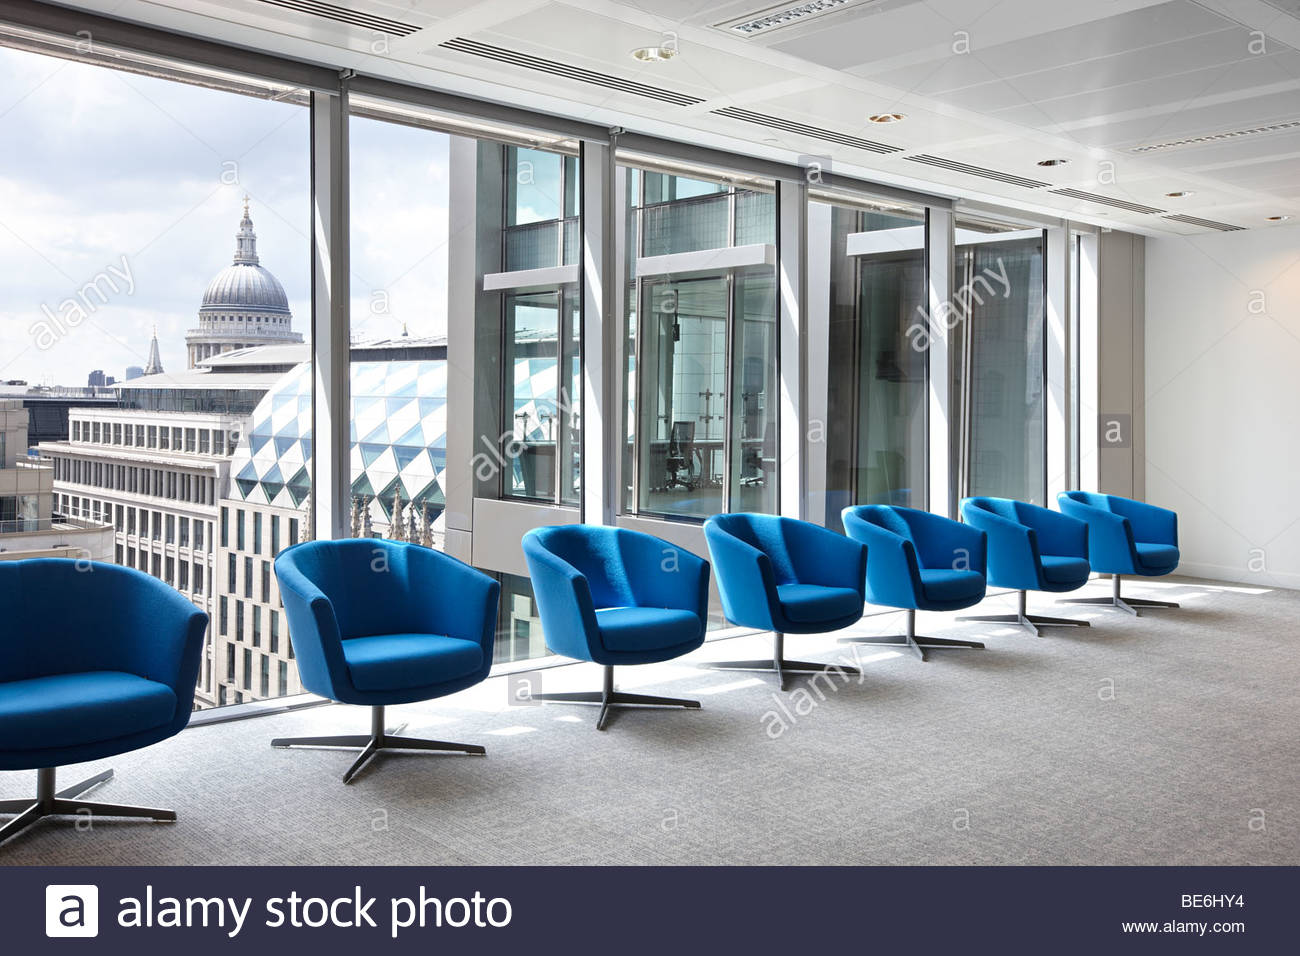 7 Türkis Wartezimmer Stühle Büro London Stockfoto Bild 25961352